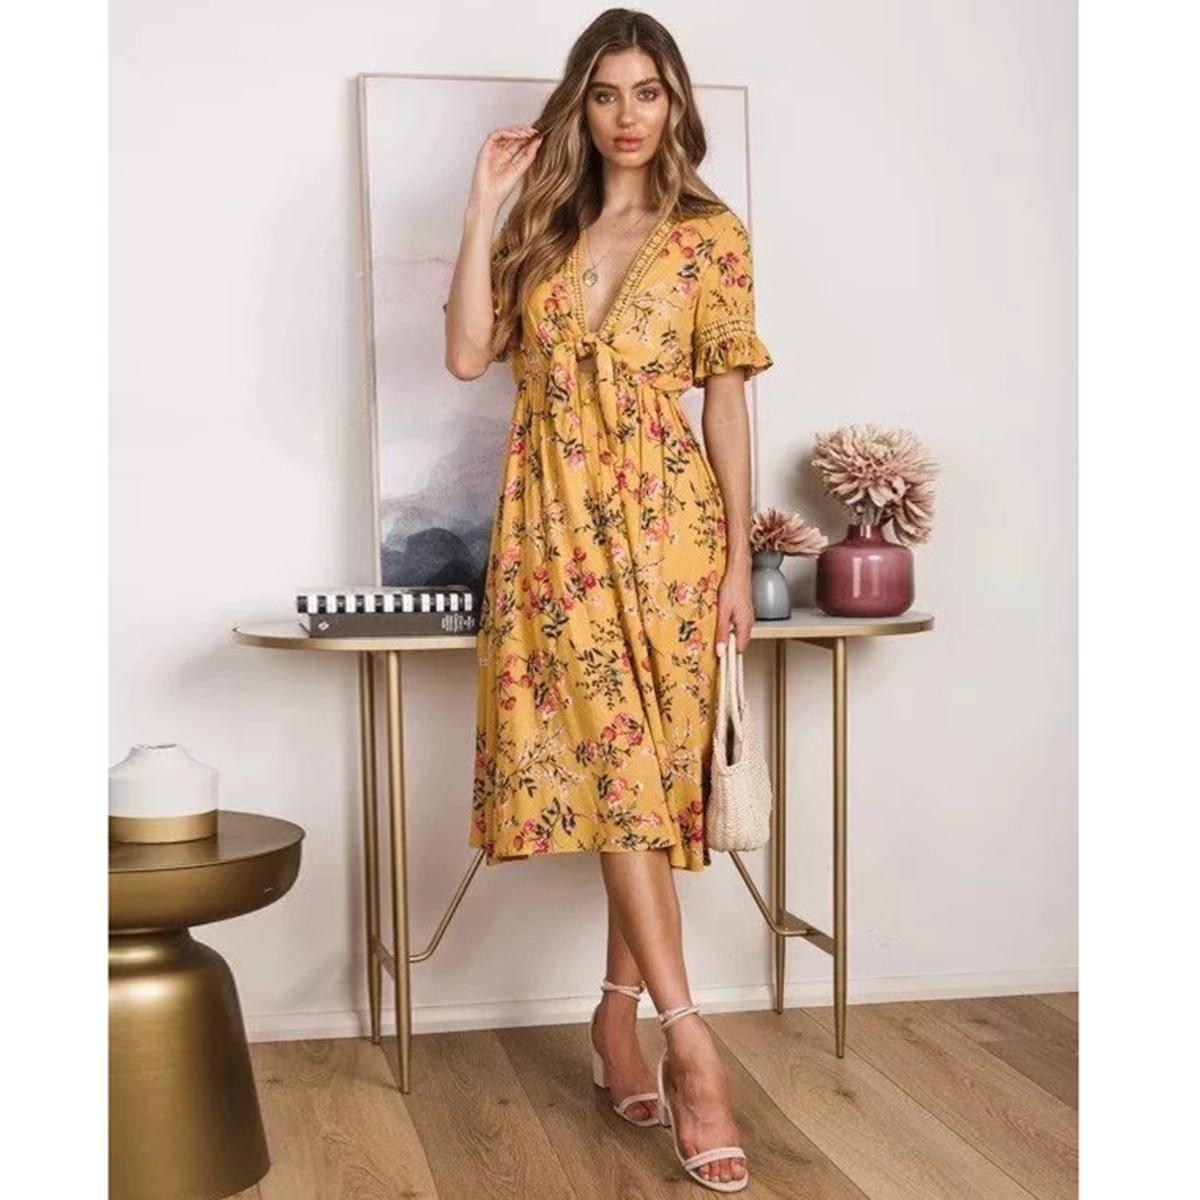 Floral Chic Midi Dress Women Short Sleeve Lace Bow Trim V neck Vintage Dress Summer Clothes 2019 Boho Beach Party Hippie Dress